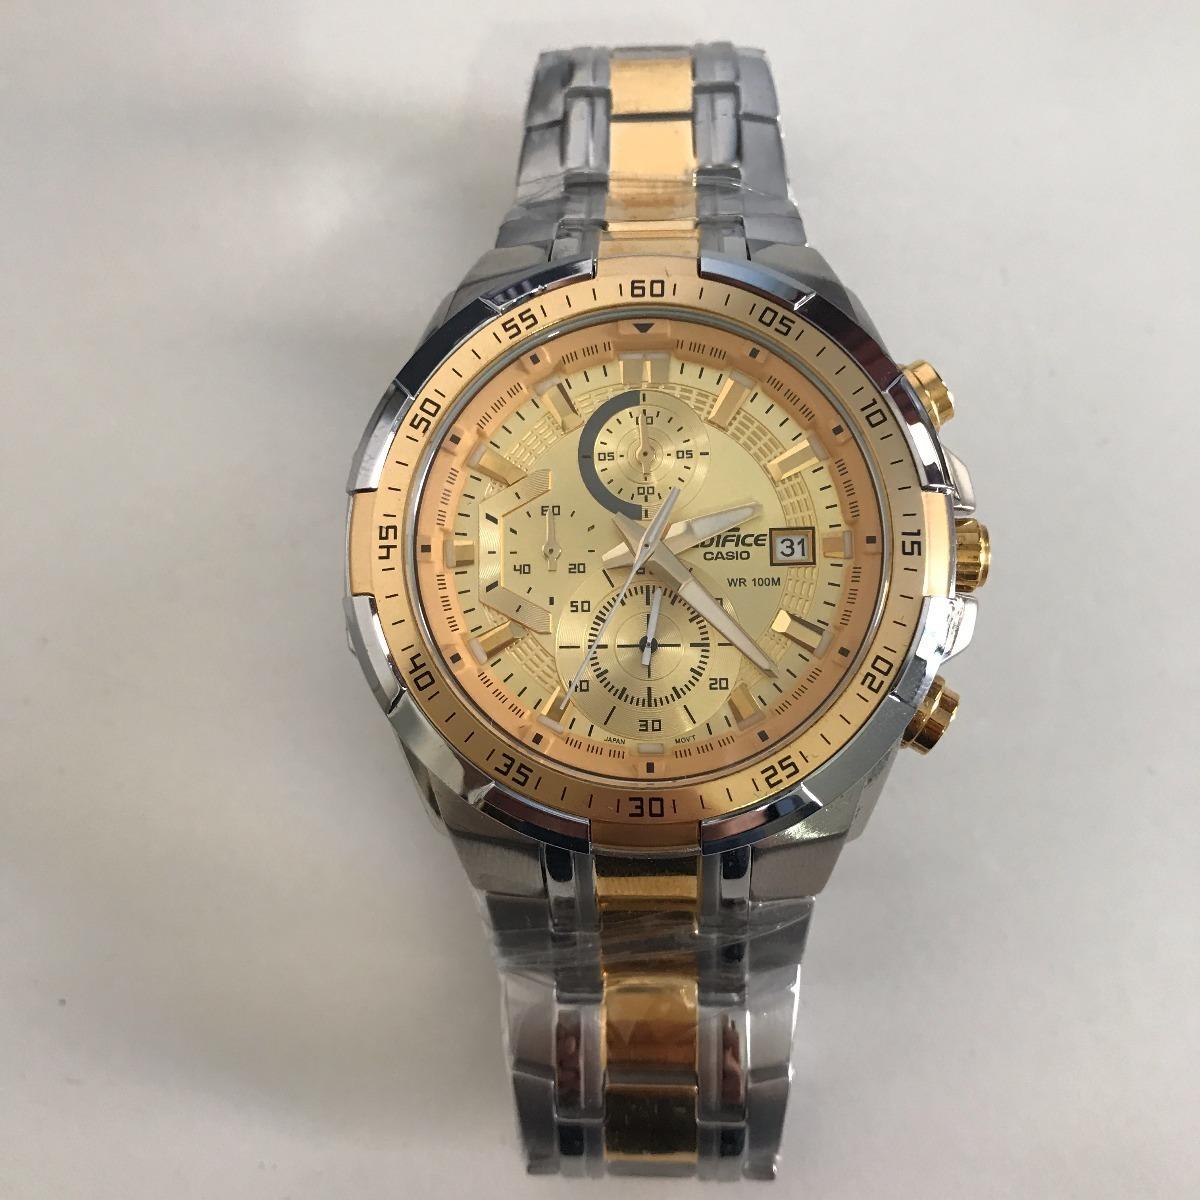 8a025bff15c relógio casio edifice ef-539 masculino prata fundo dourado. Carregando zoom.